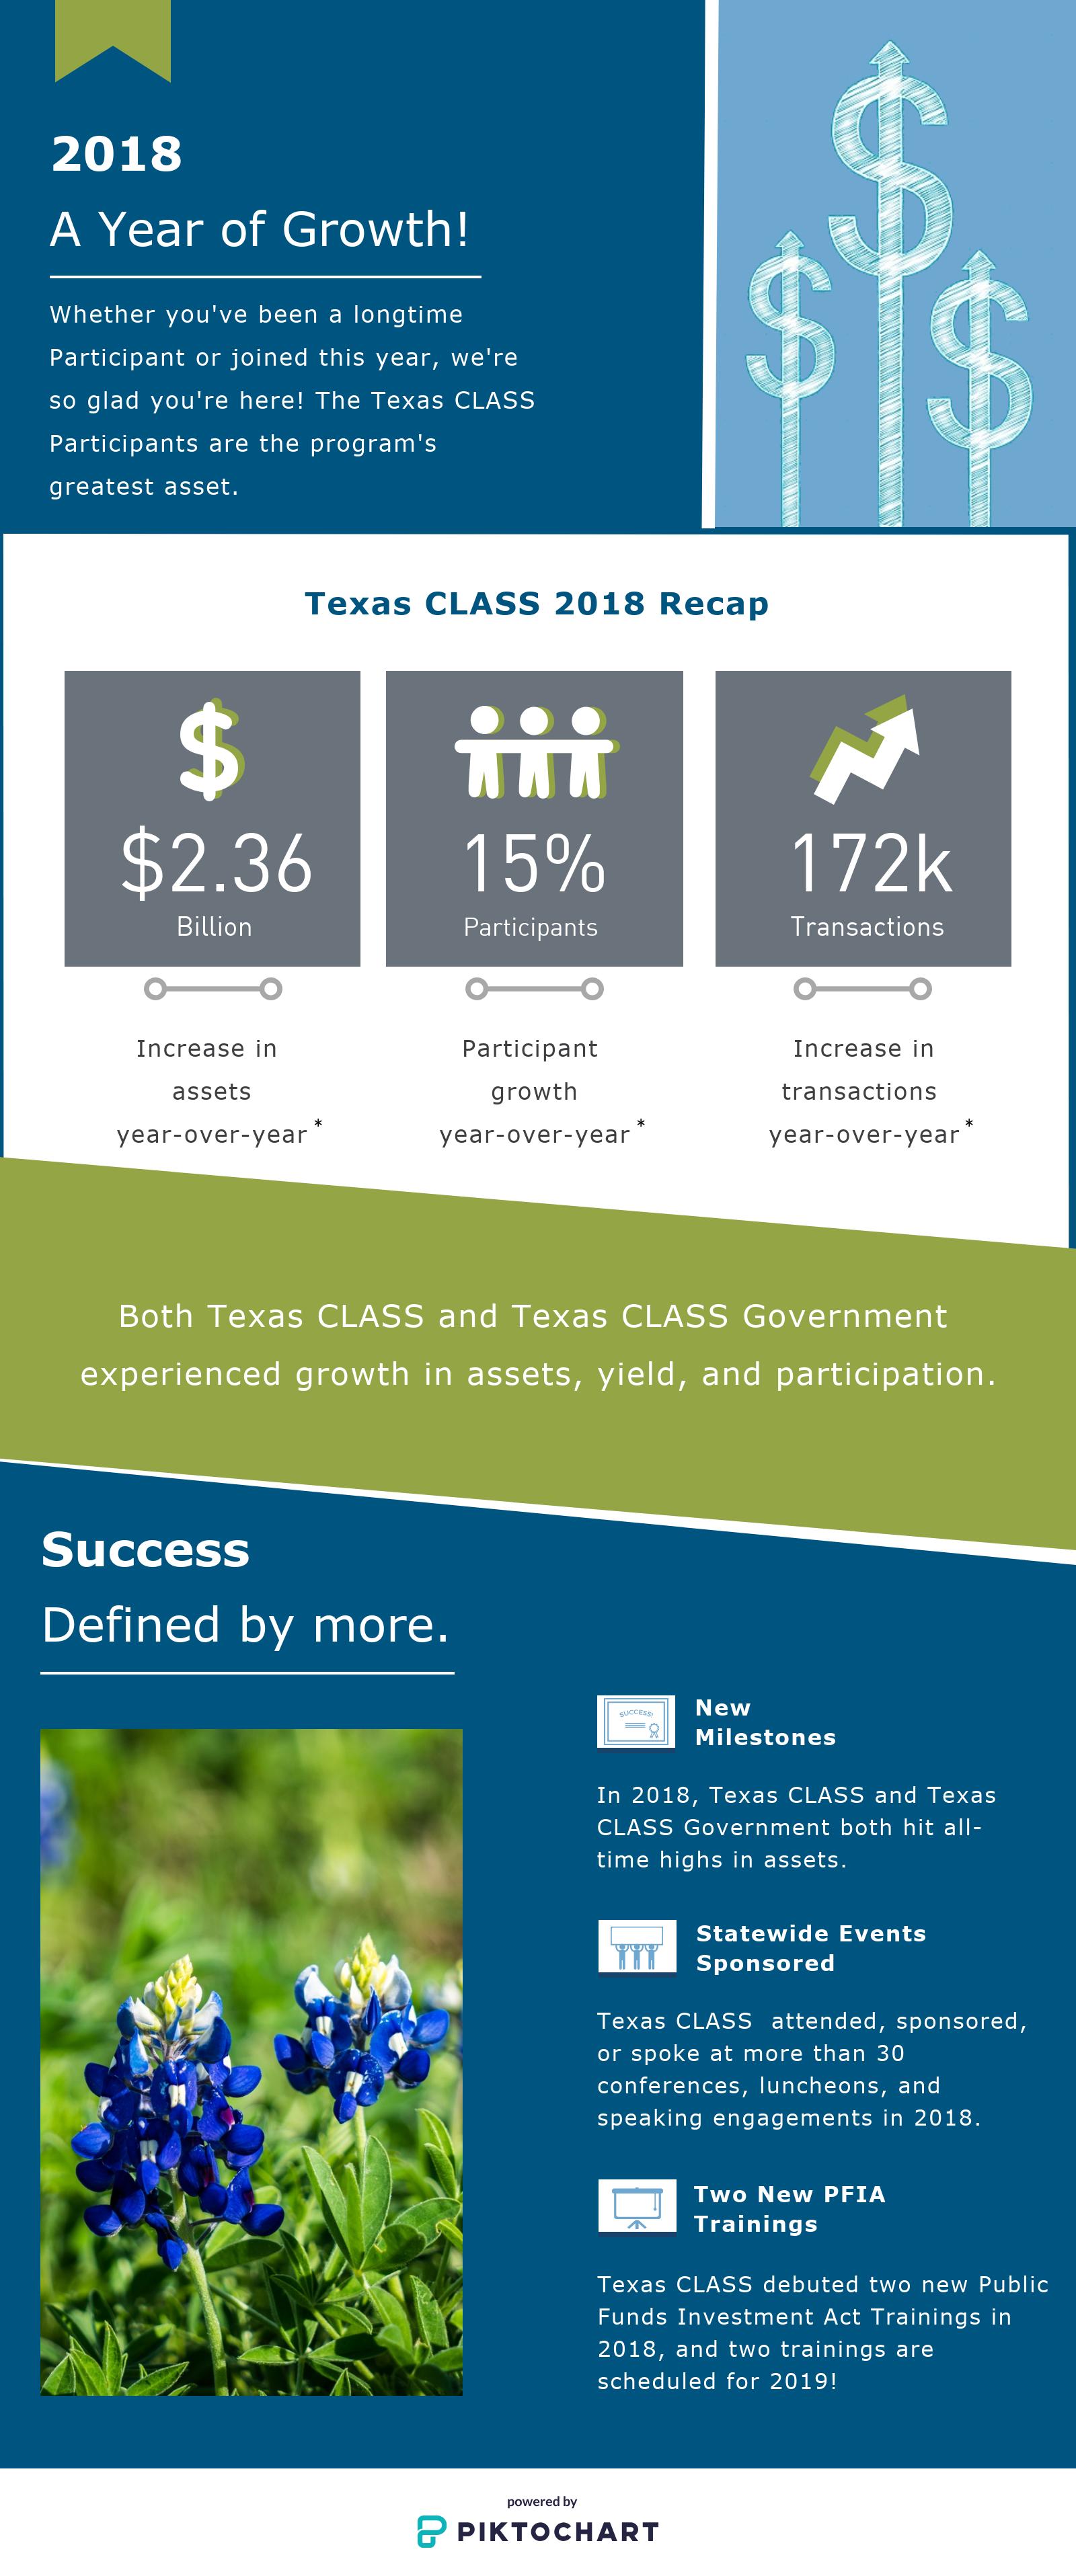 02.19 - Texas CLASS Investor